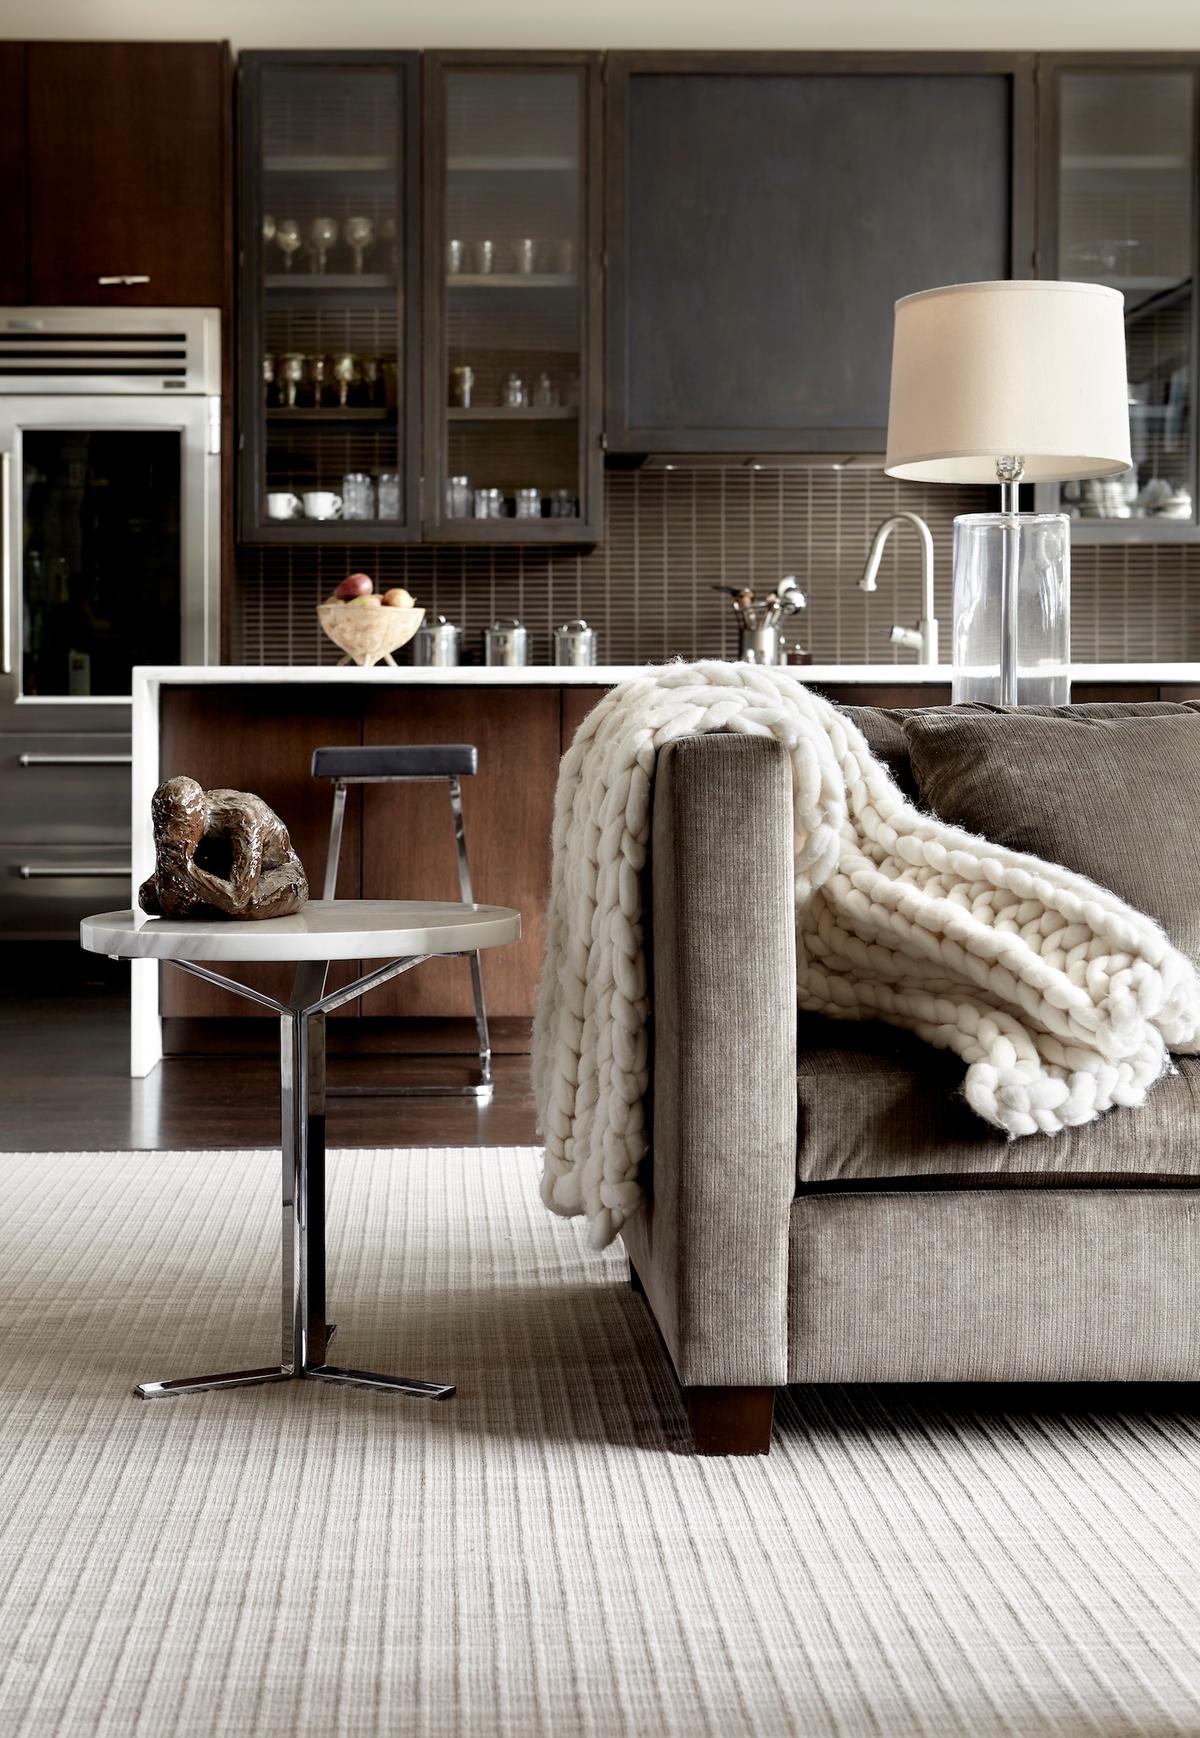 Pär Bengtsson Home Interior Editorial Photography53.jpeg